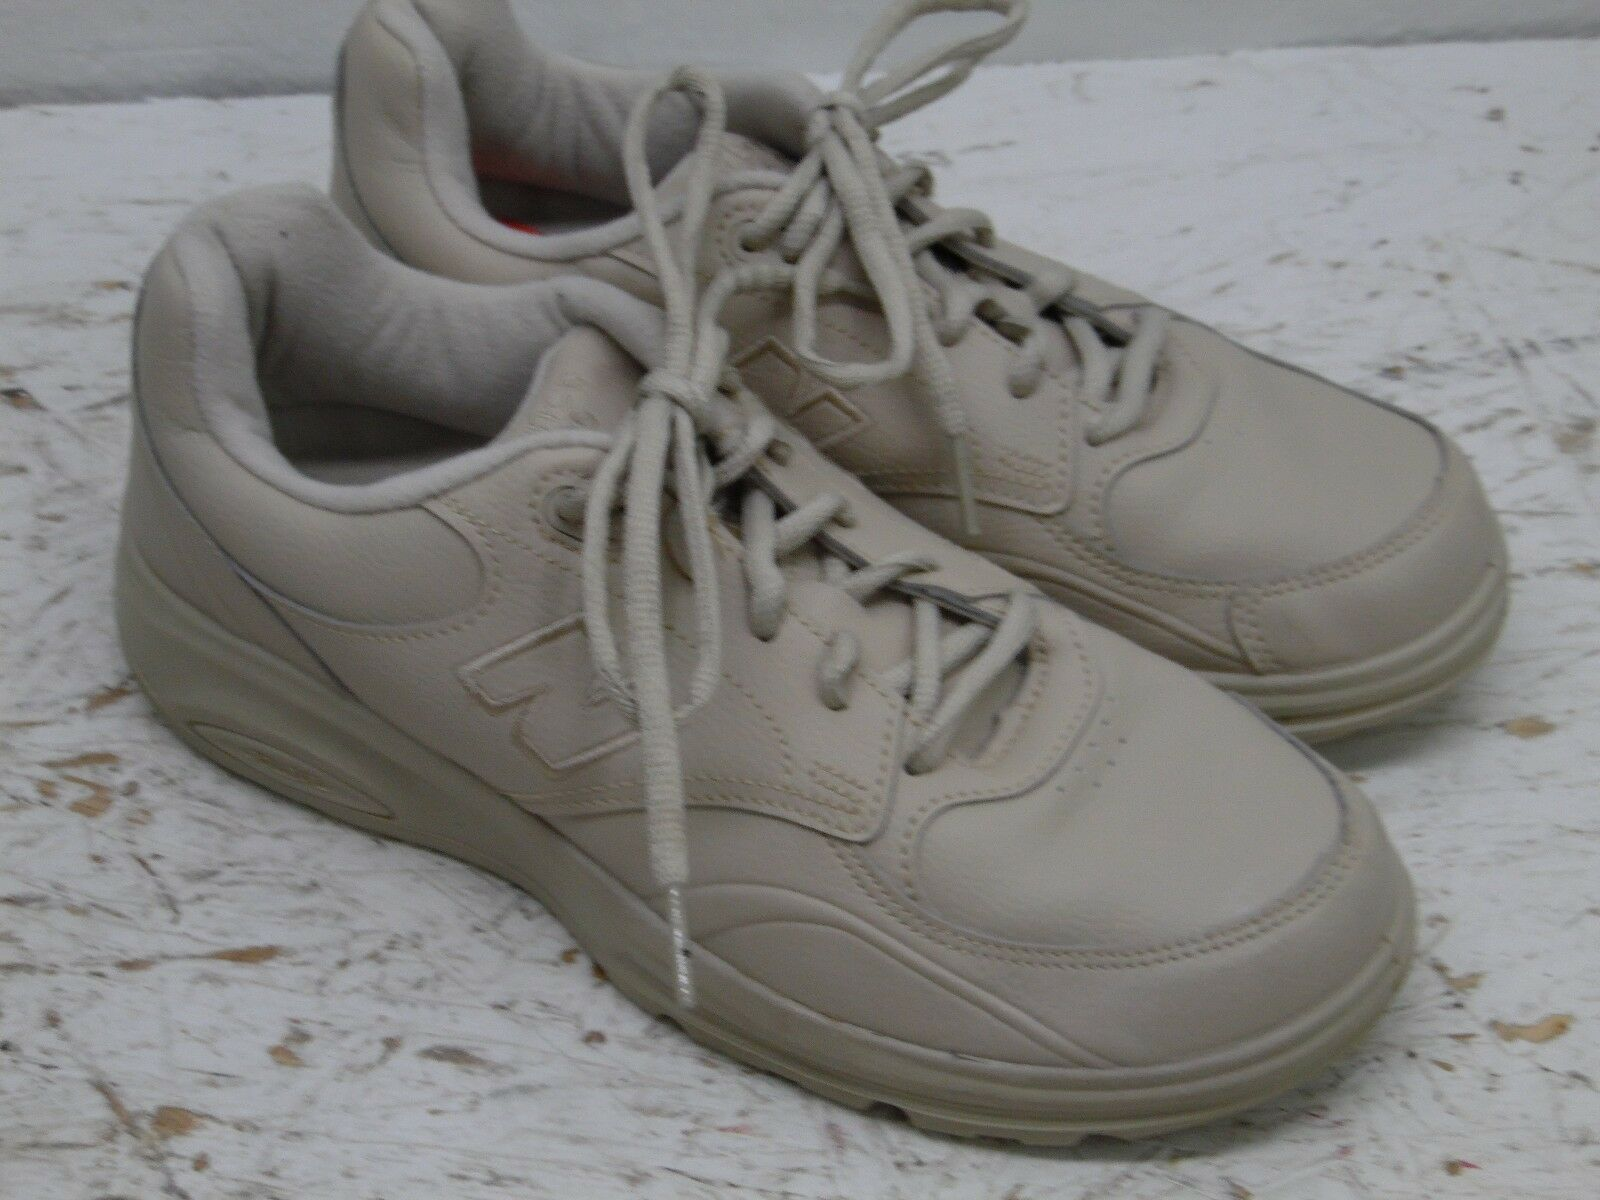 online retailer 00841 72d3b ... New Balance 812 Tan Comfort Walking Walking Walking Sneakers Shoes  Men s Size 7- EUC fb4ee2 ...